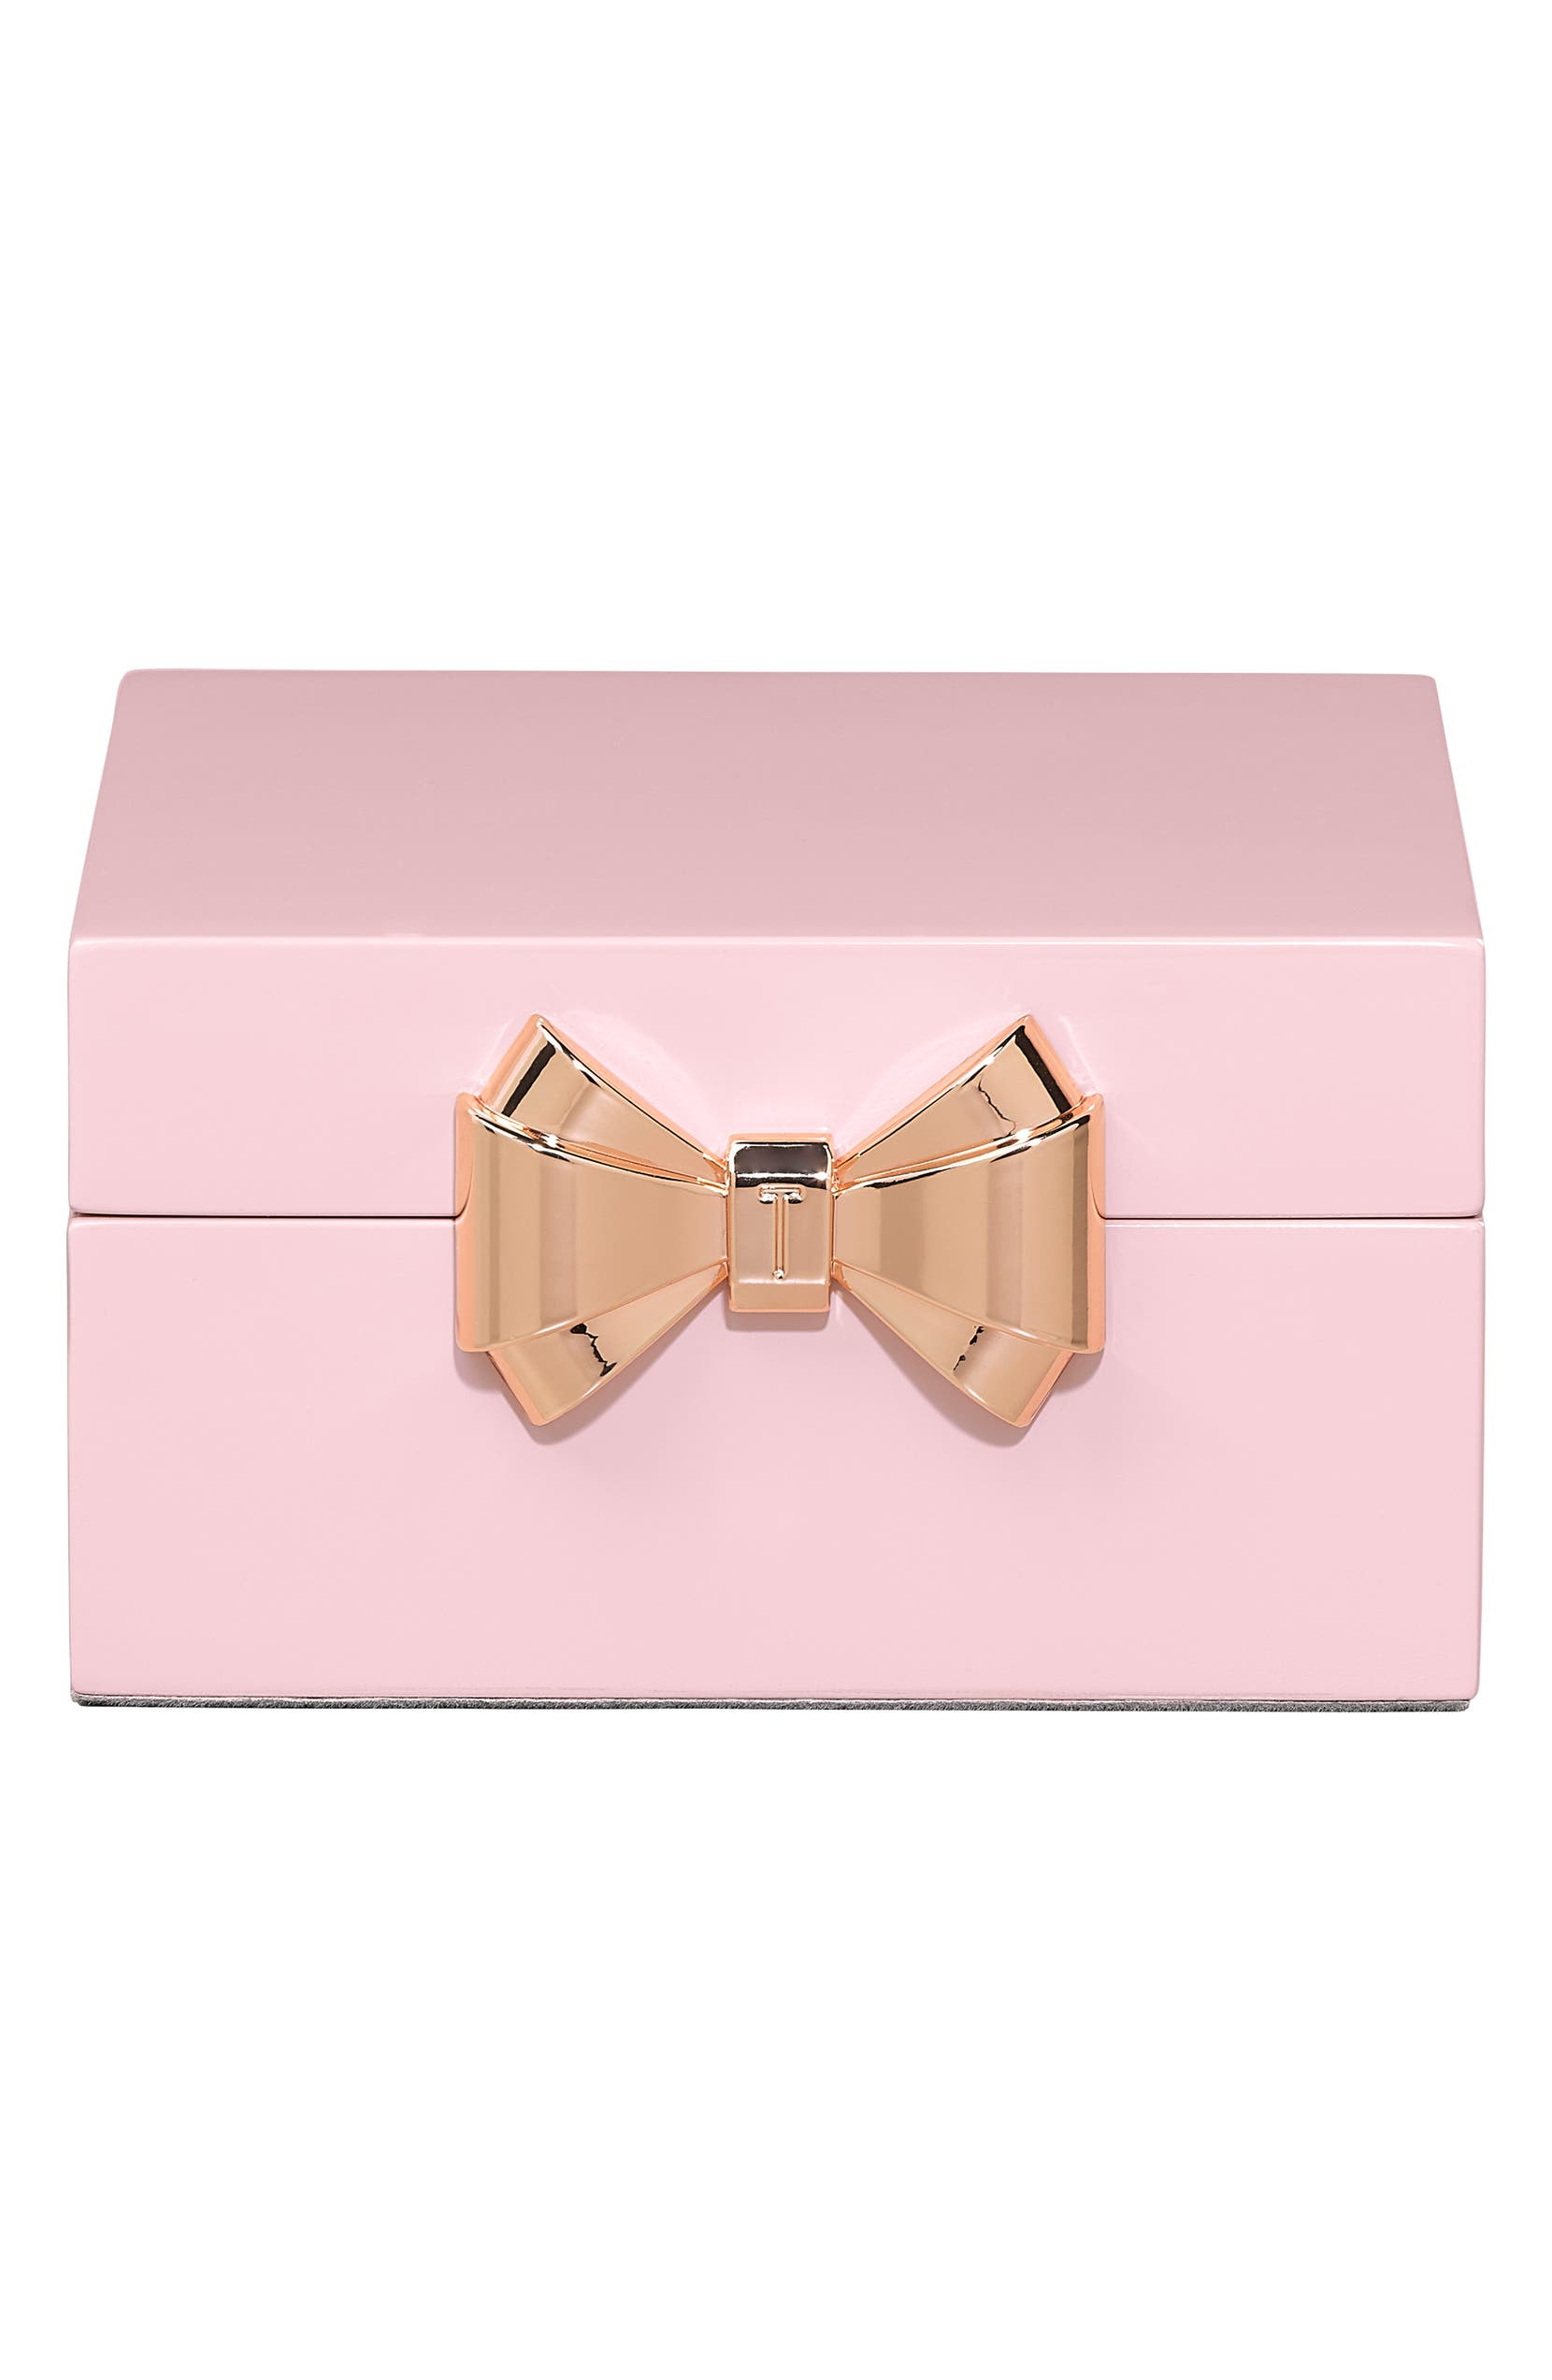 5cc31593b Ted Baker London Square Jewelry Box